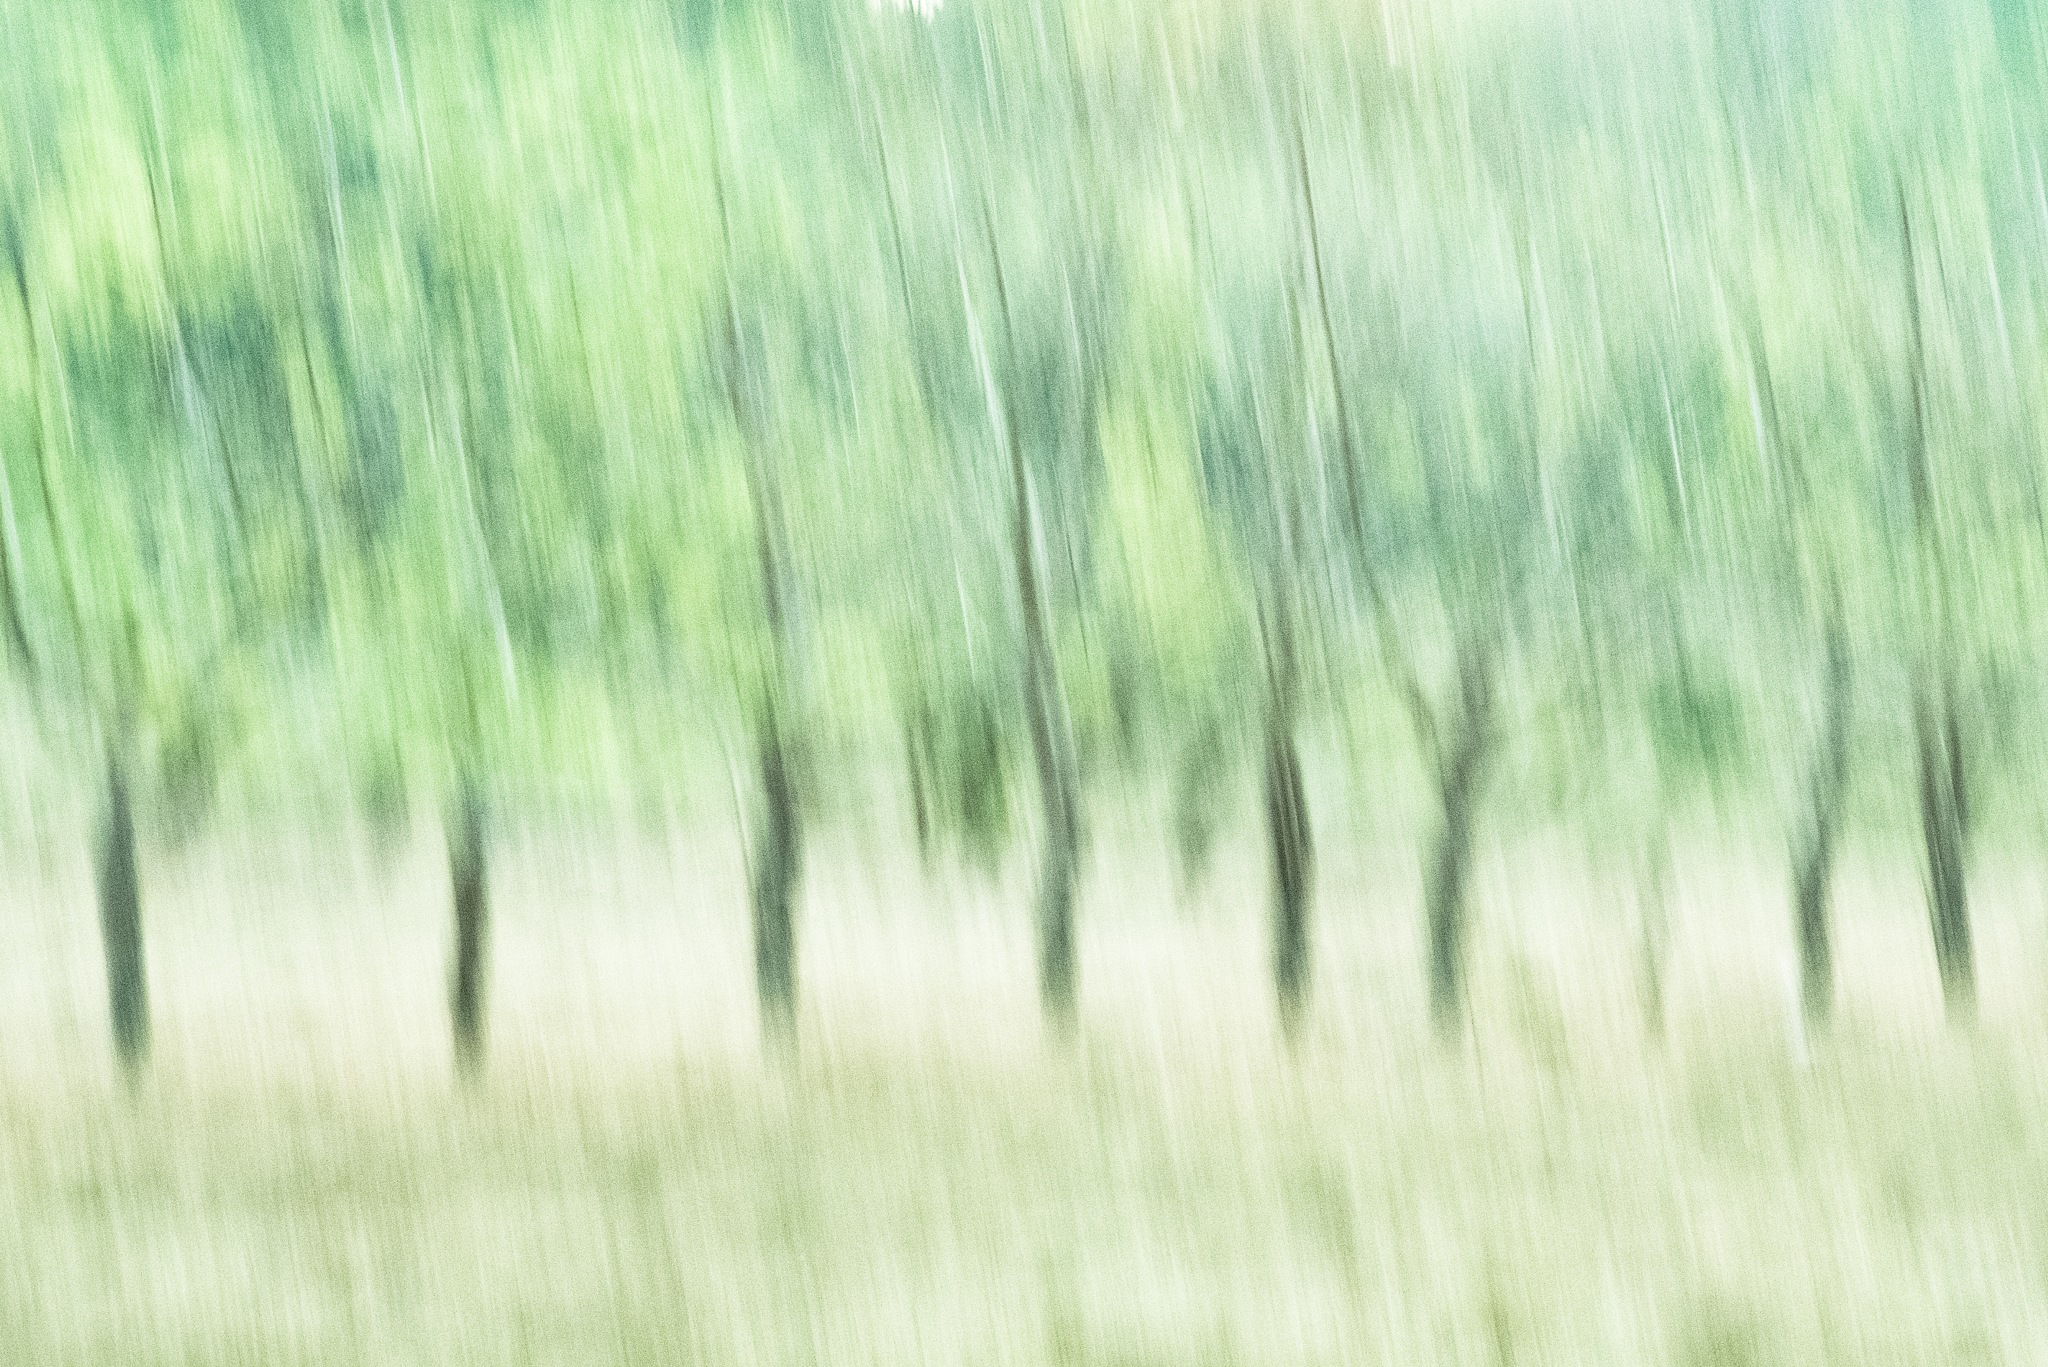 Dream Tree Abstract © Copyright 2018, Verne Varona by VerneVarona